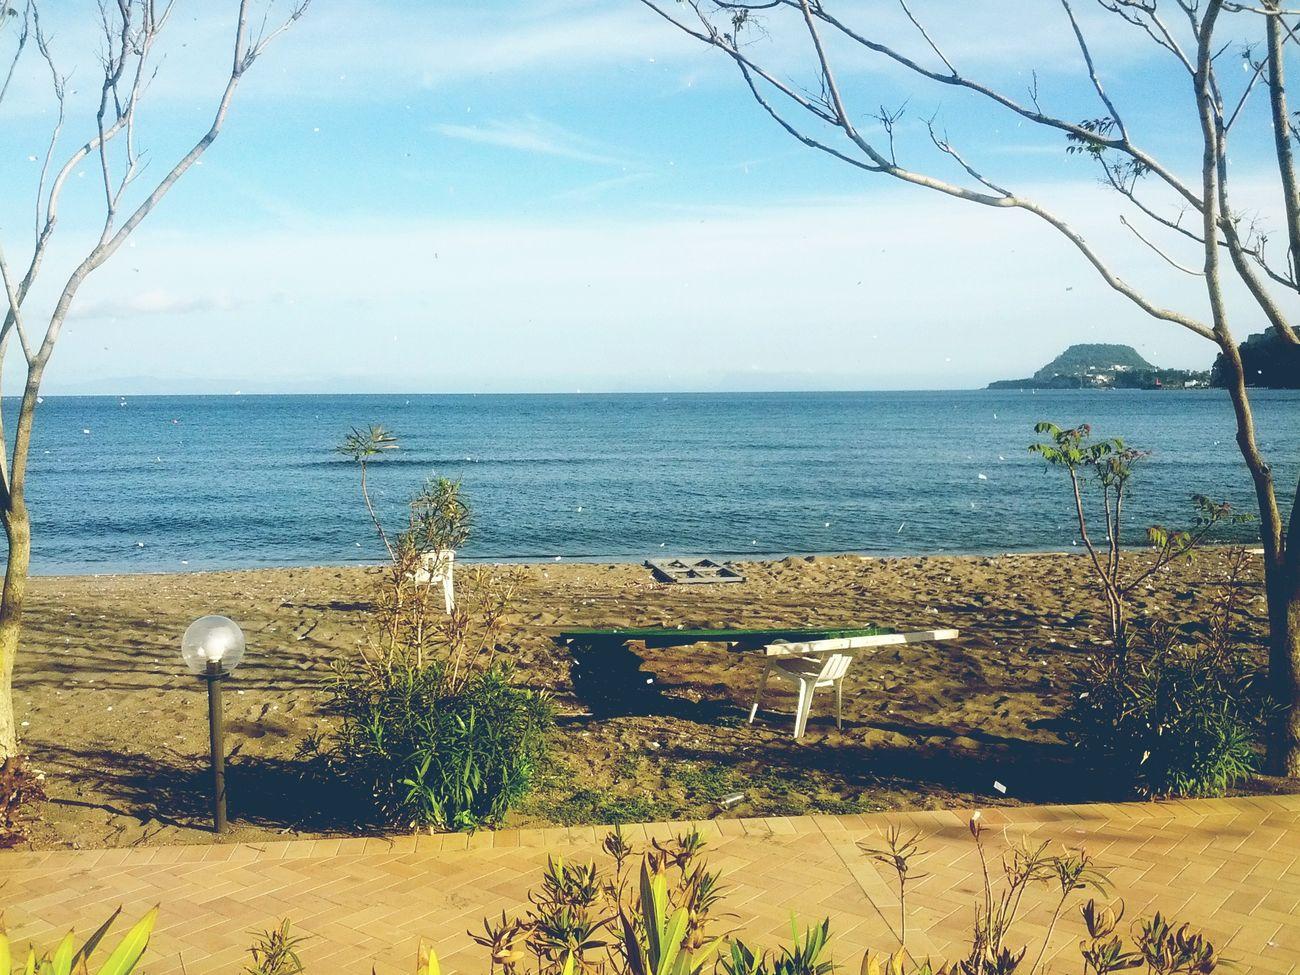 Sea & sun. ☀ Seaandsun Happyness